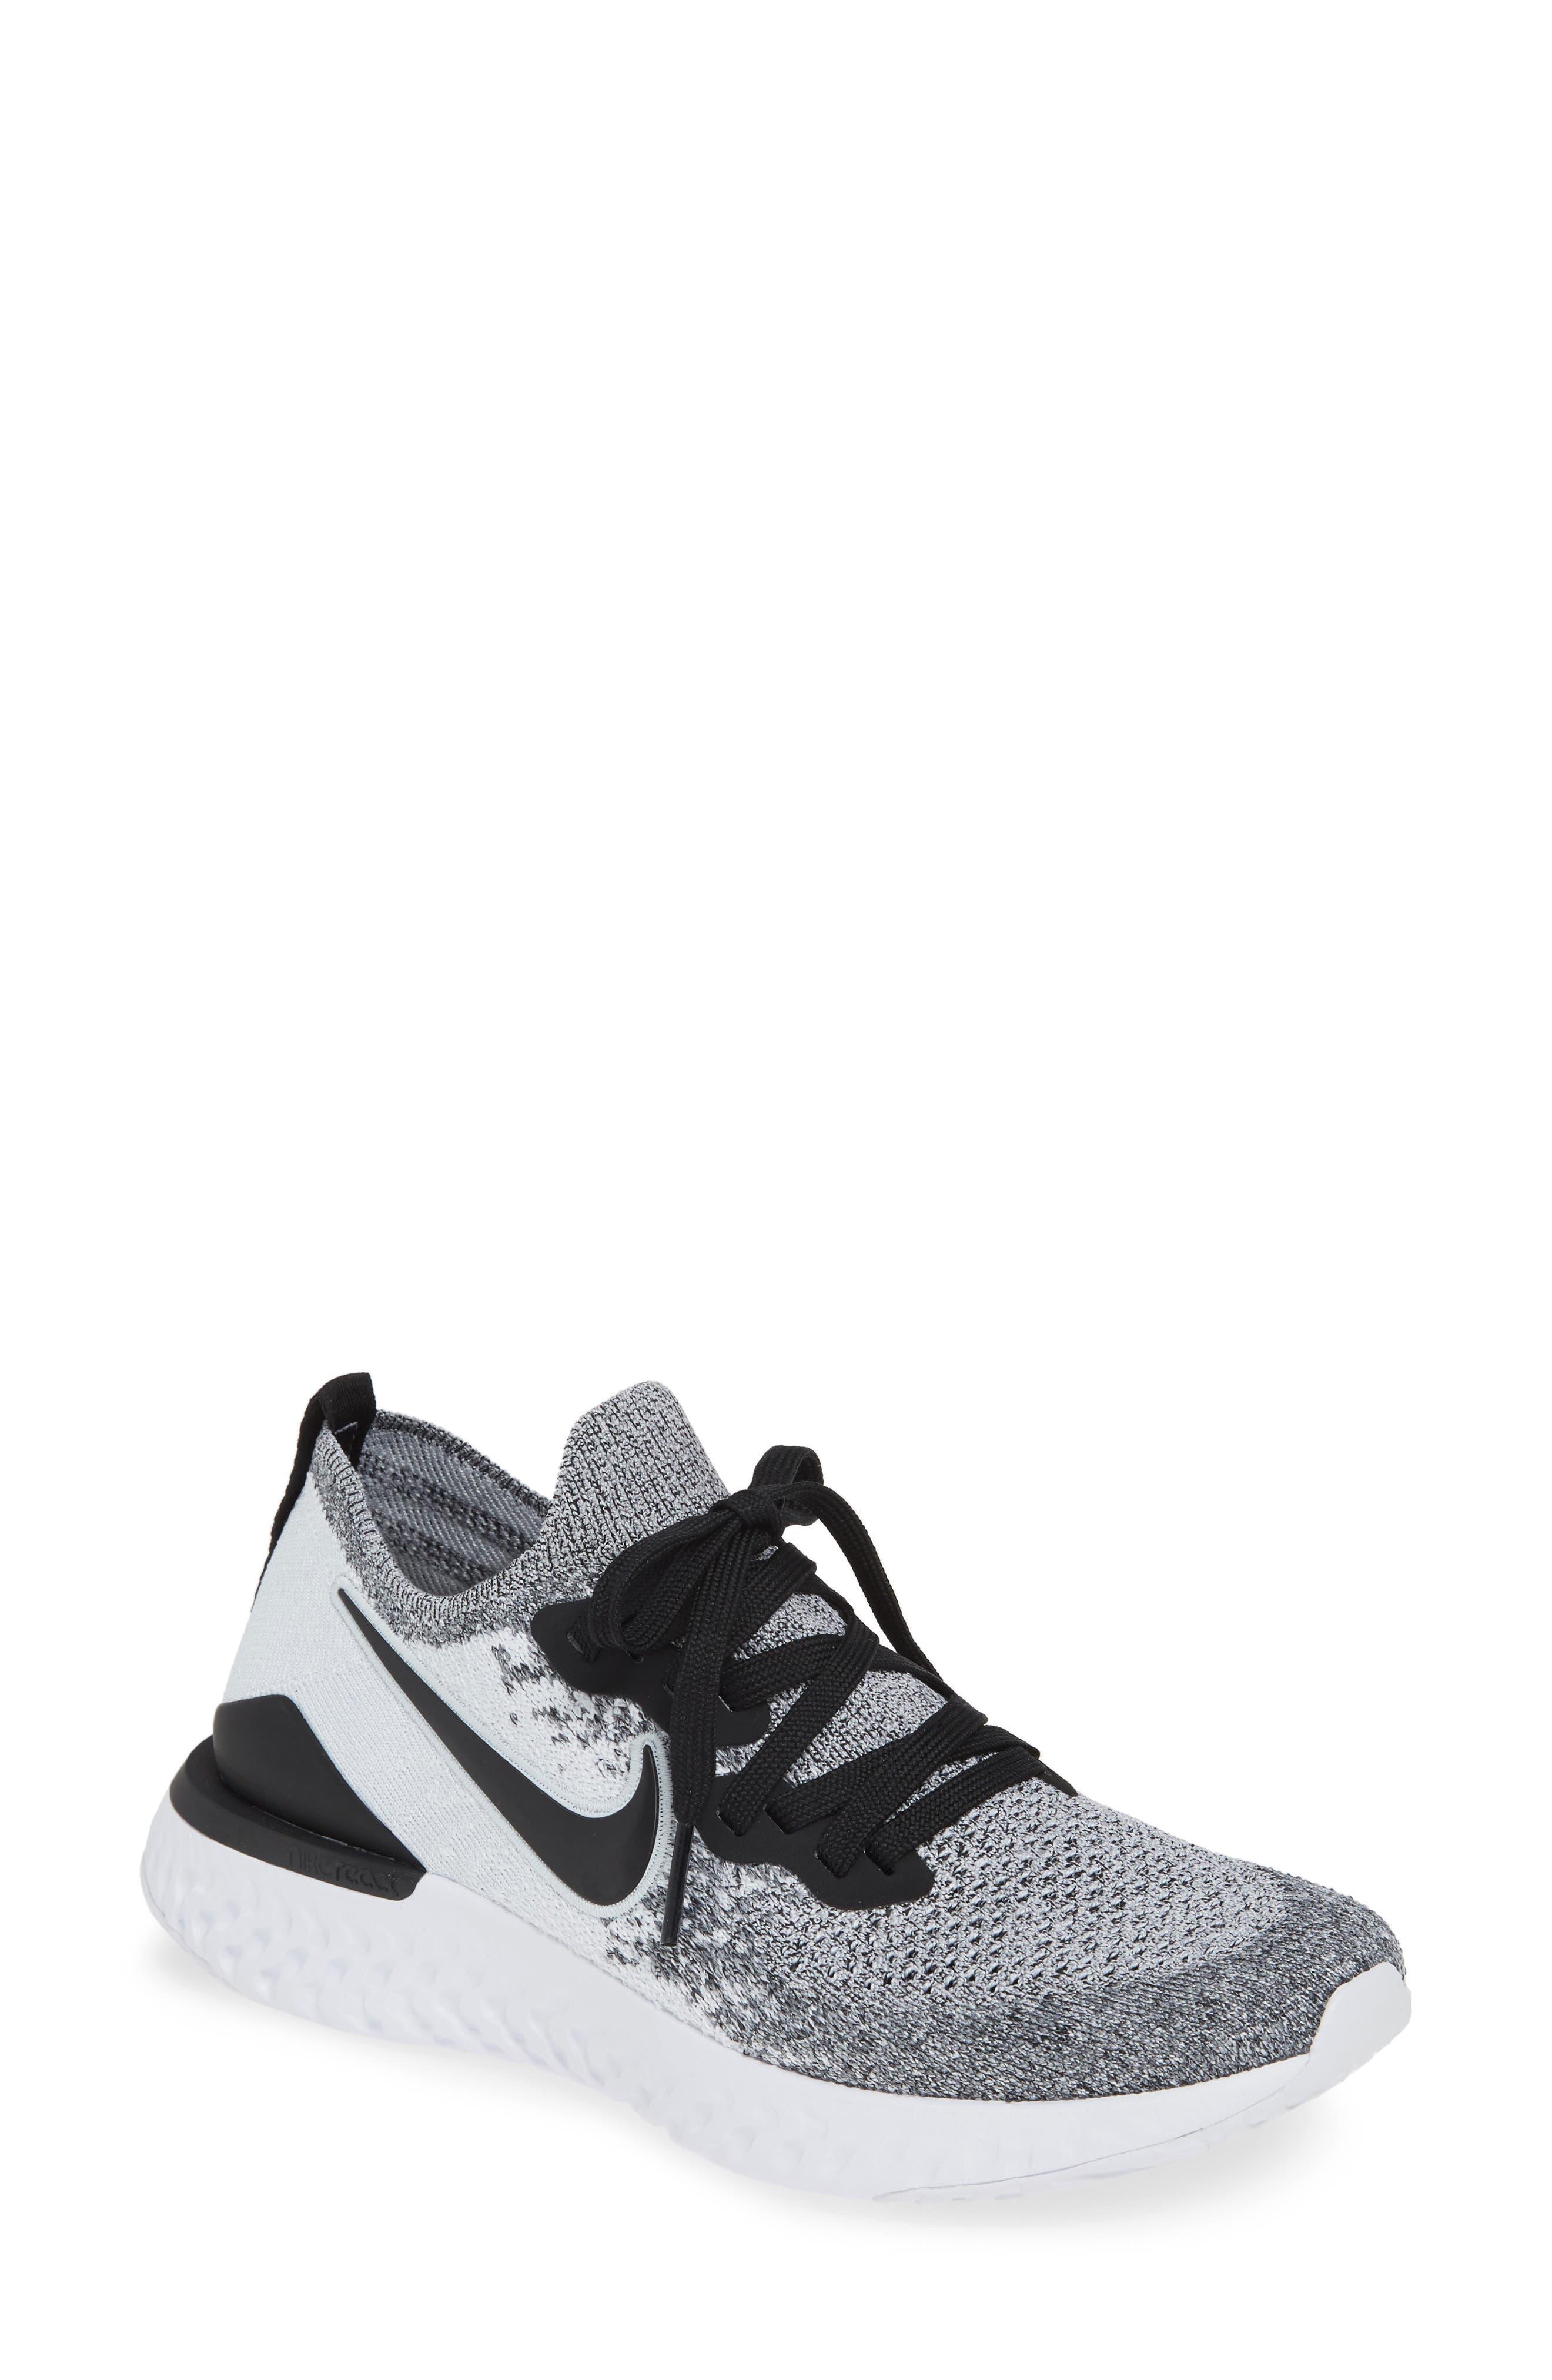 NIKE, Epic React Flyknit 2 Running Shoe, Main thumbnail 1, color, WHITE/ BLACK/ PURE PLATINUM